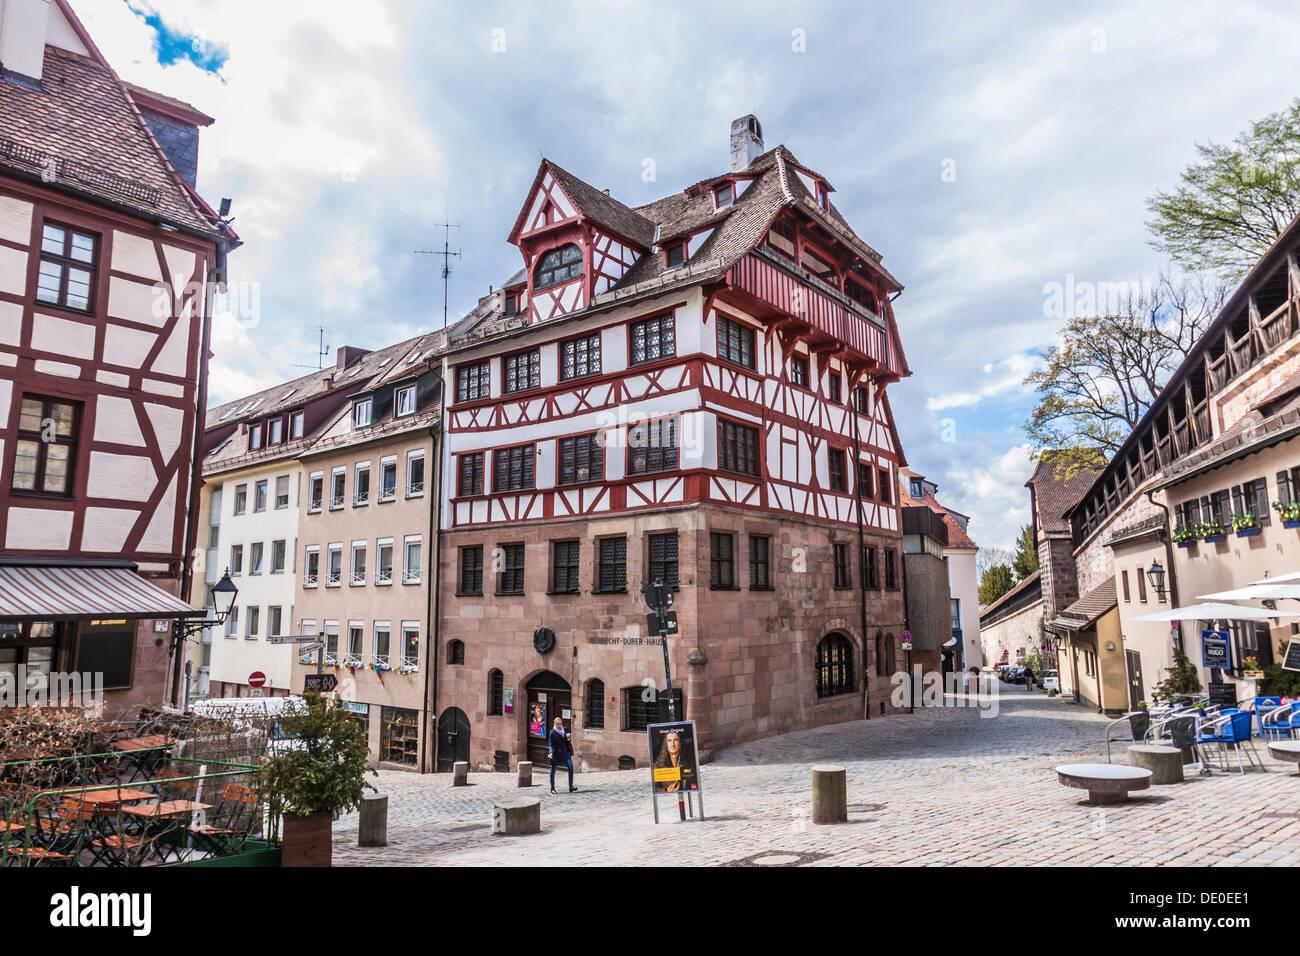 Albrecht-Dürer-Haus Gebäude am Tiergaertnertorplatz Platz, Nürnberg ...